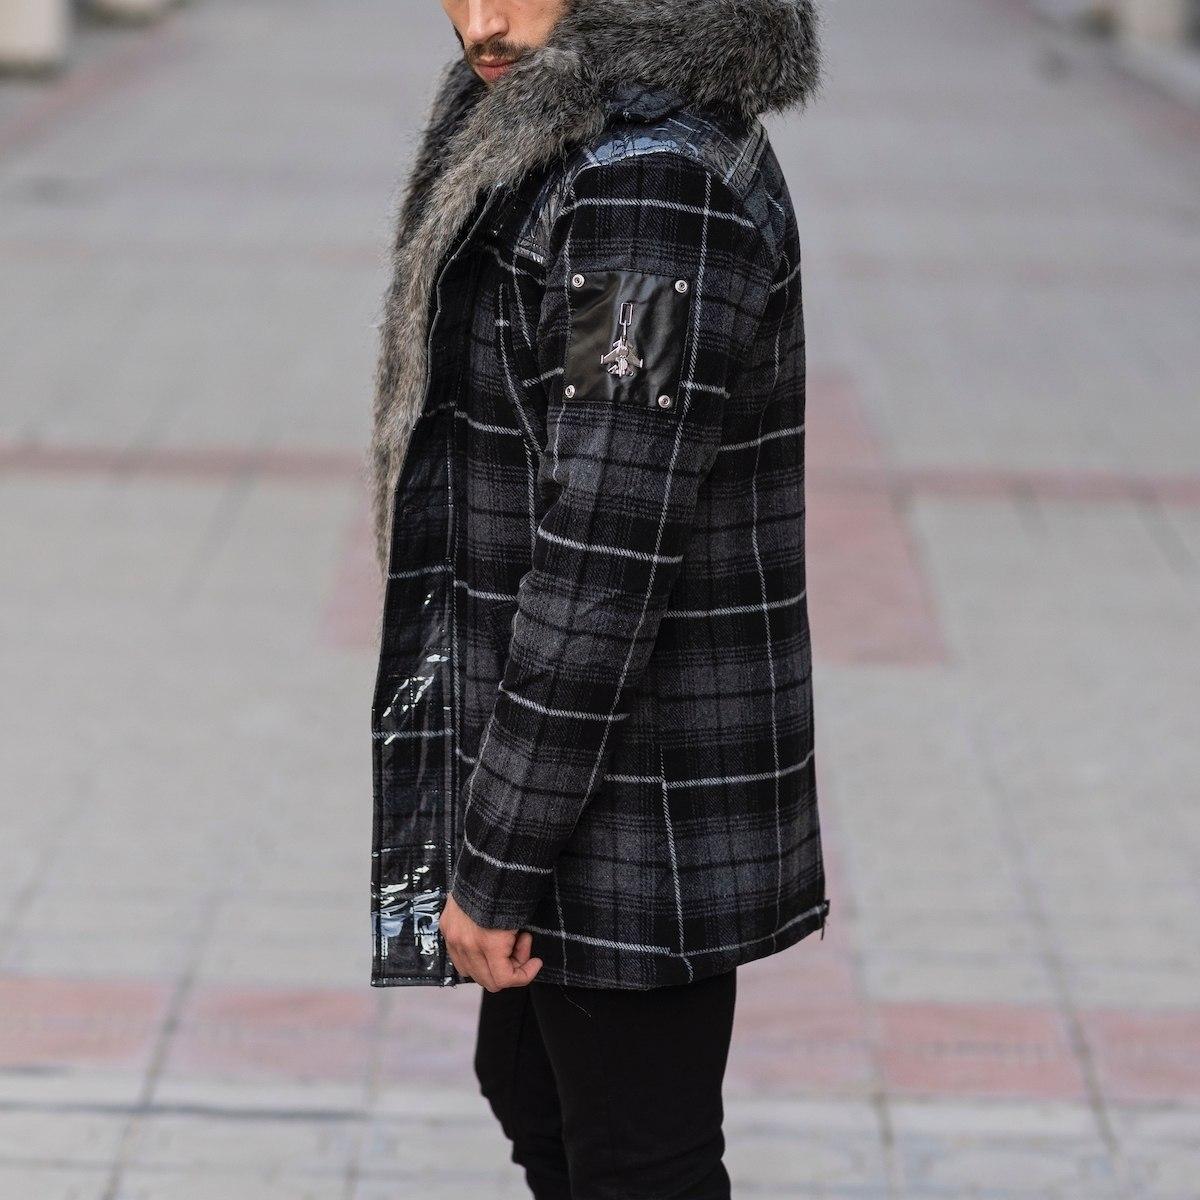 Furry Plaid Jacket With Hood MV Jacket Collection - 4